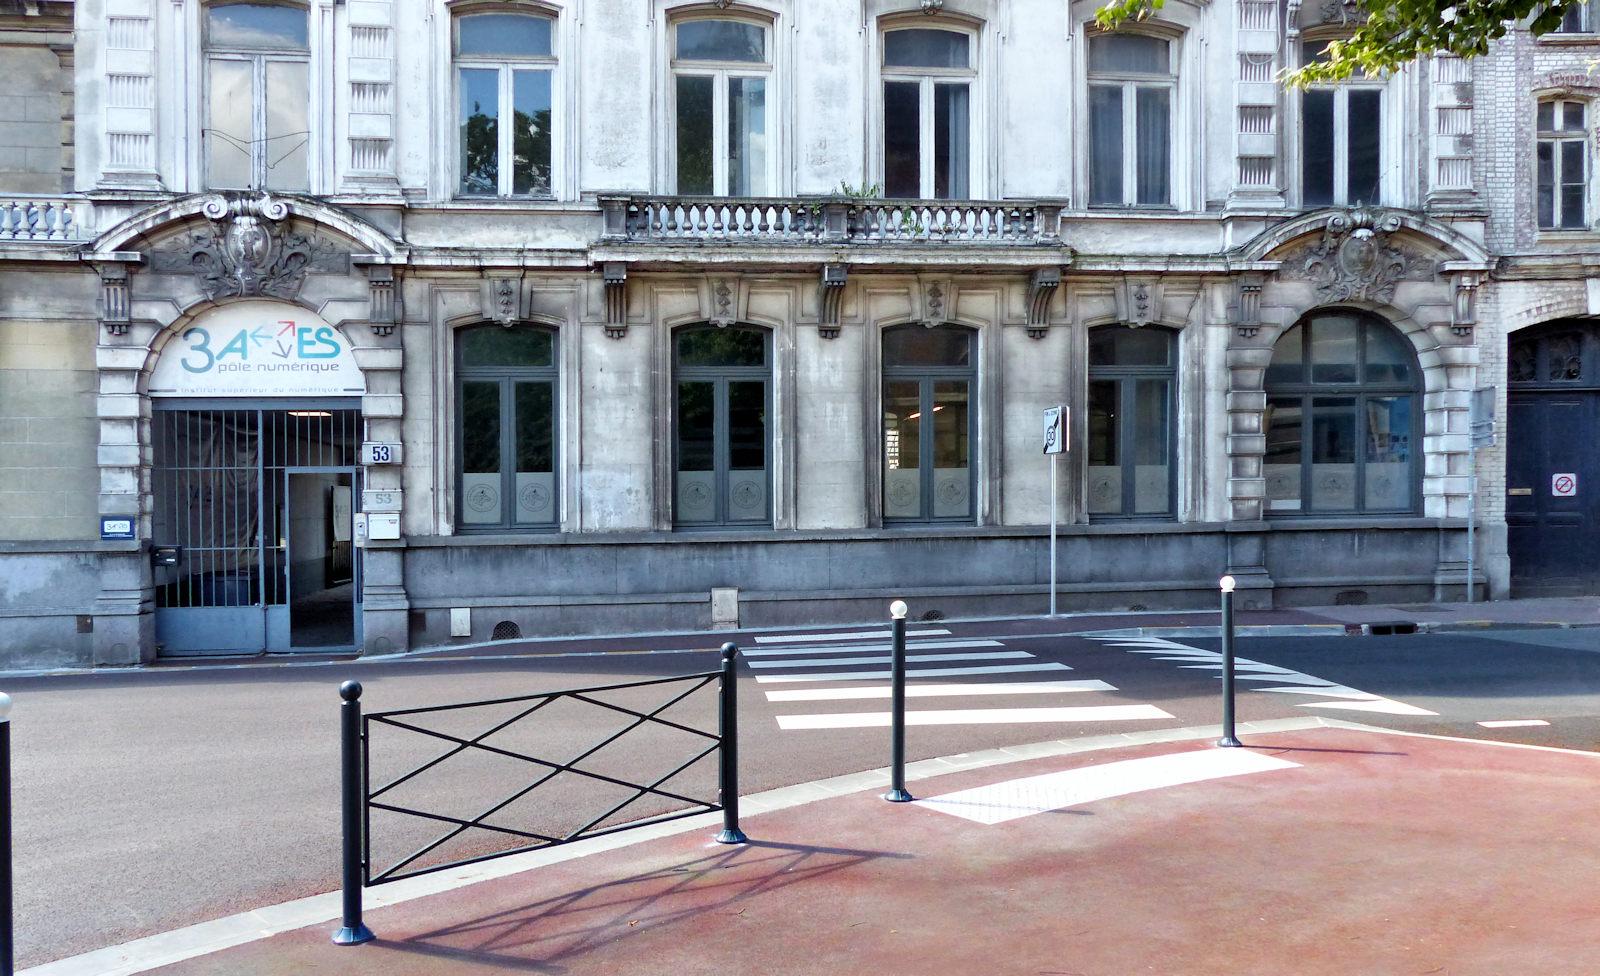 3 Axes Institut Tourcoing